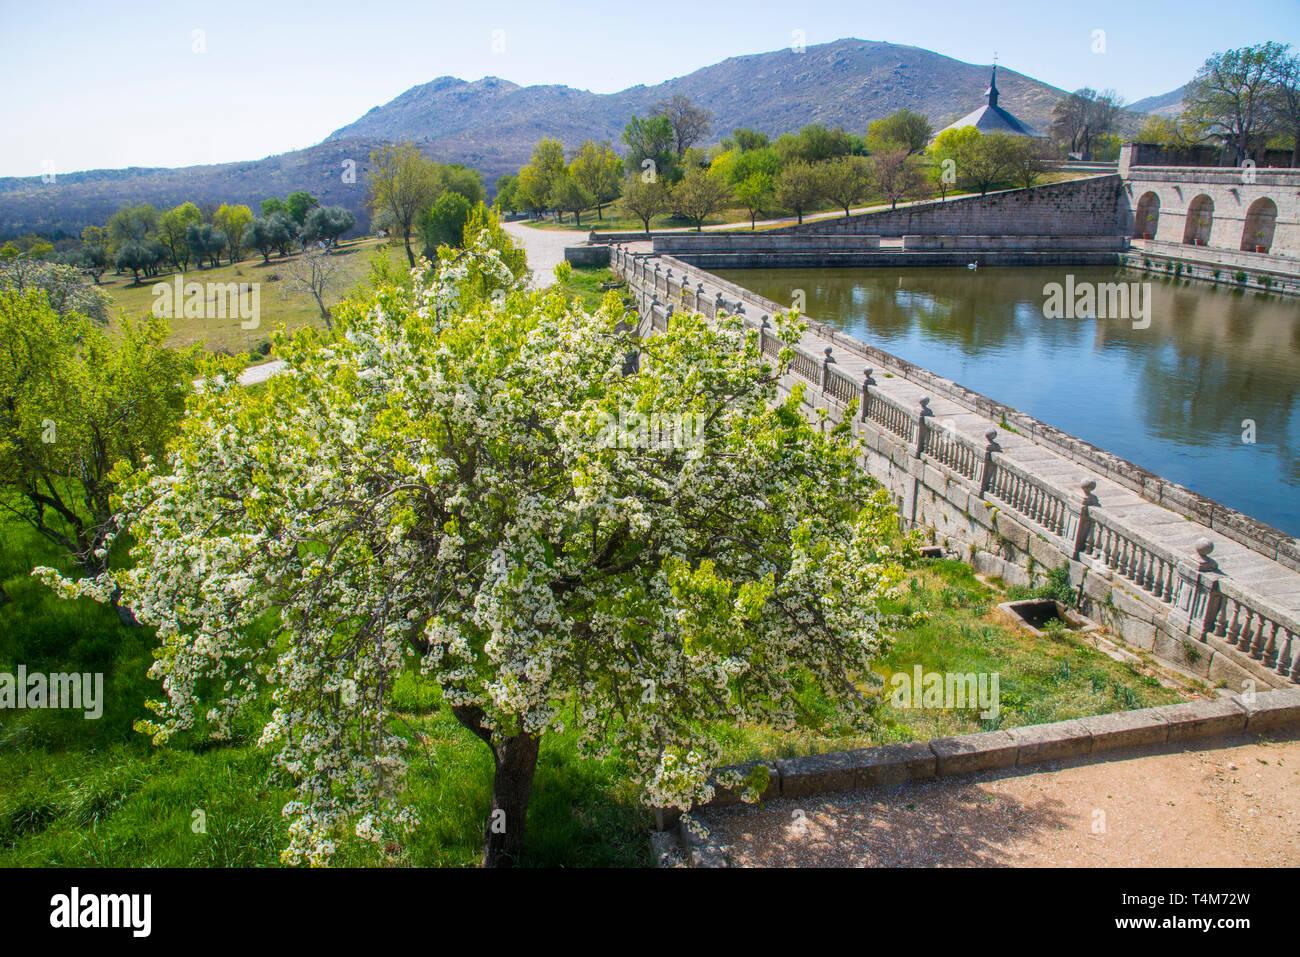 Huerto de los Frailes. Royal Monastery, San Lorenzo del Escorial, Madrid province, Spain. Stock Photo